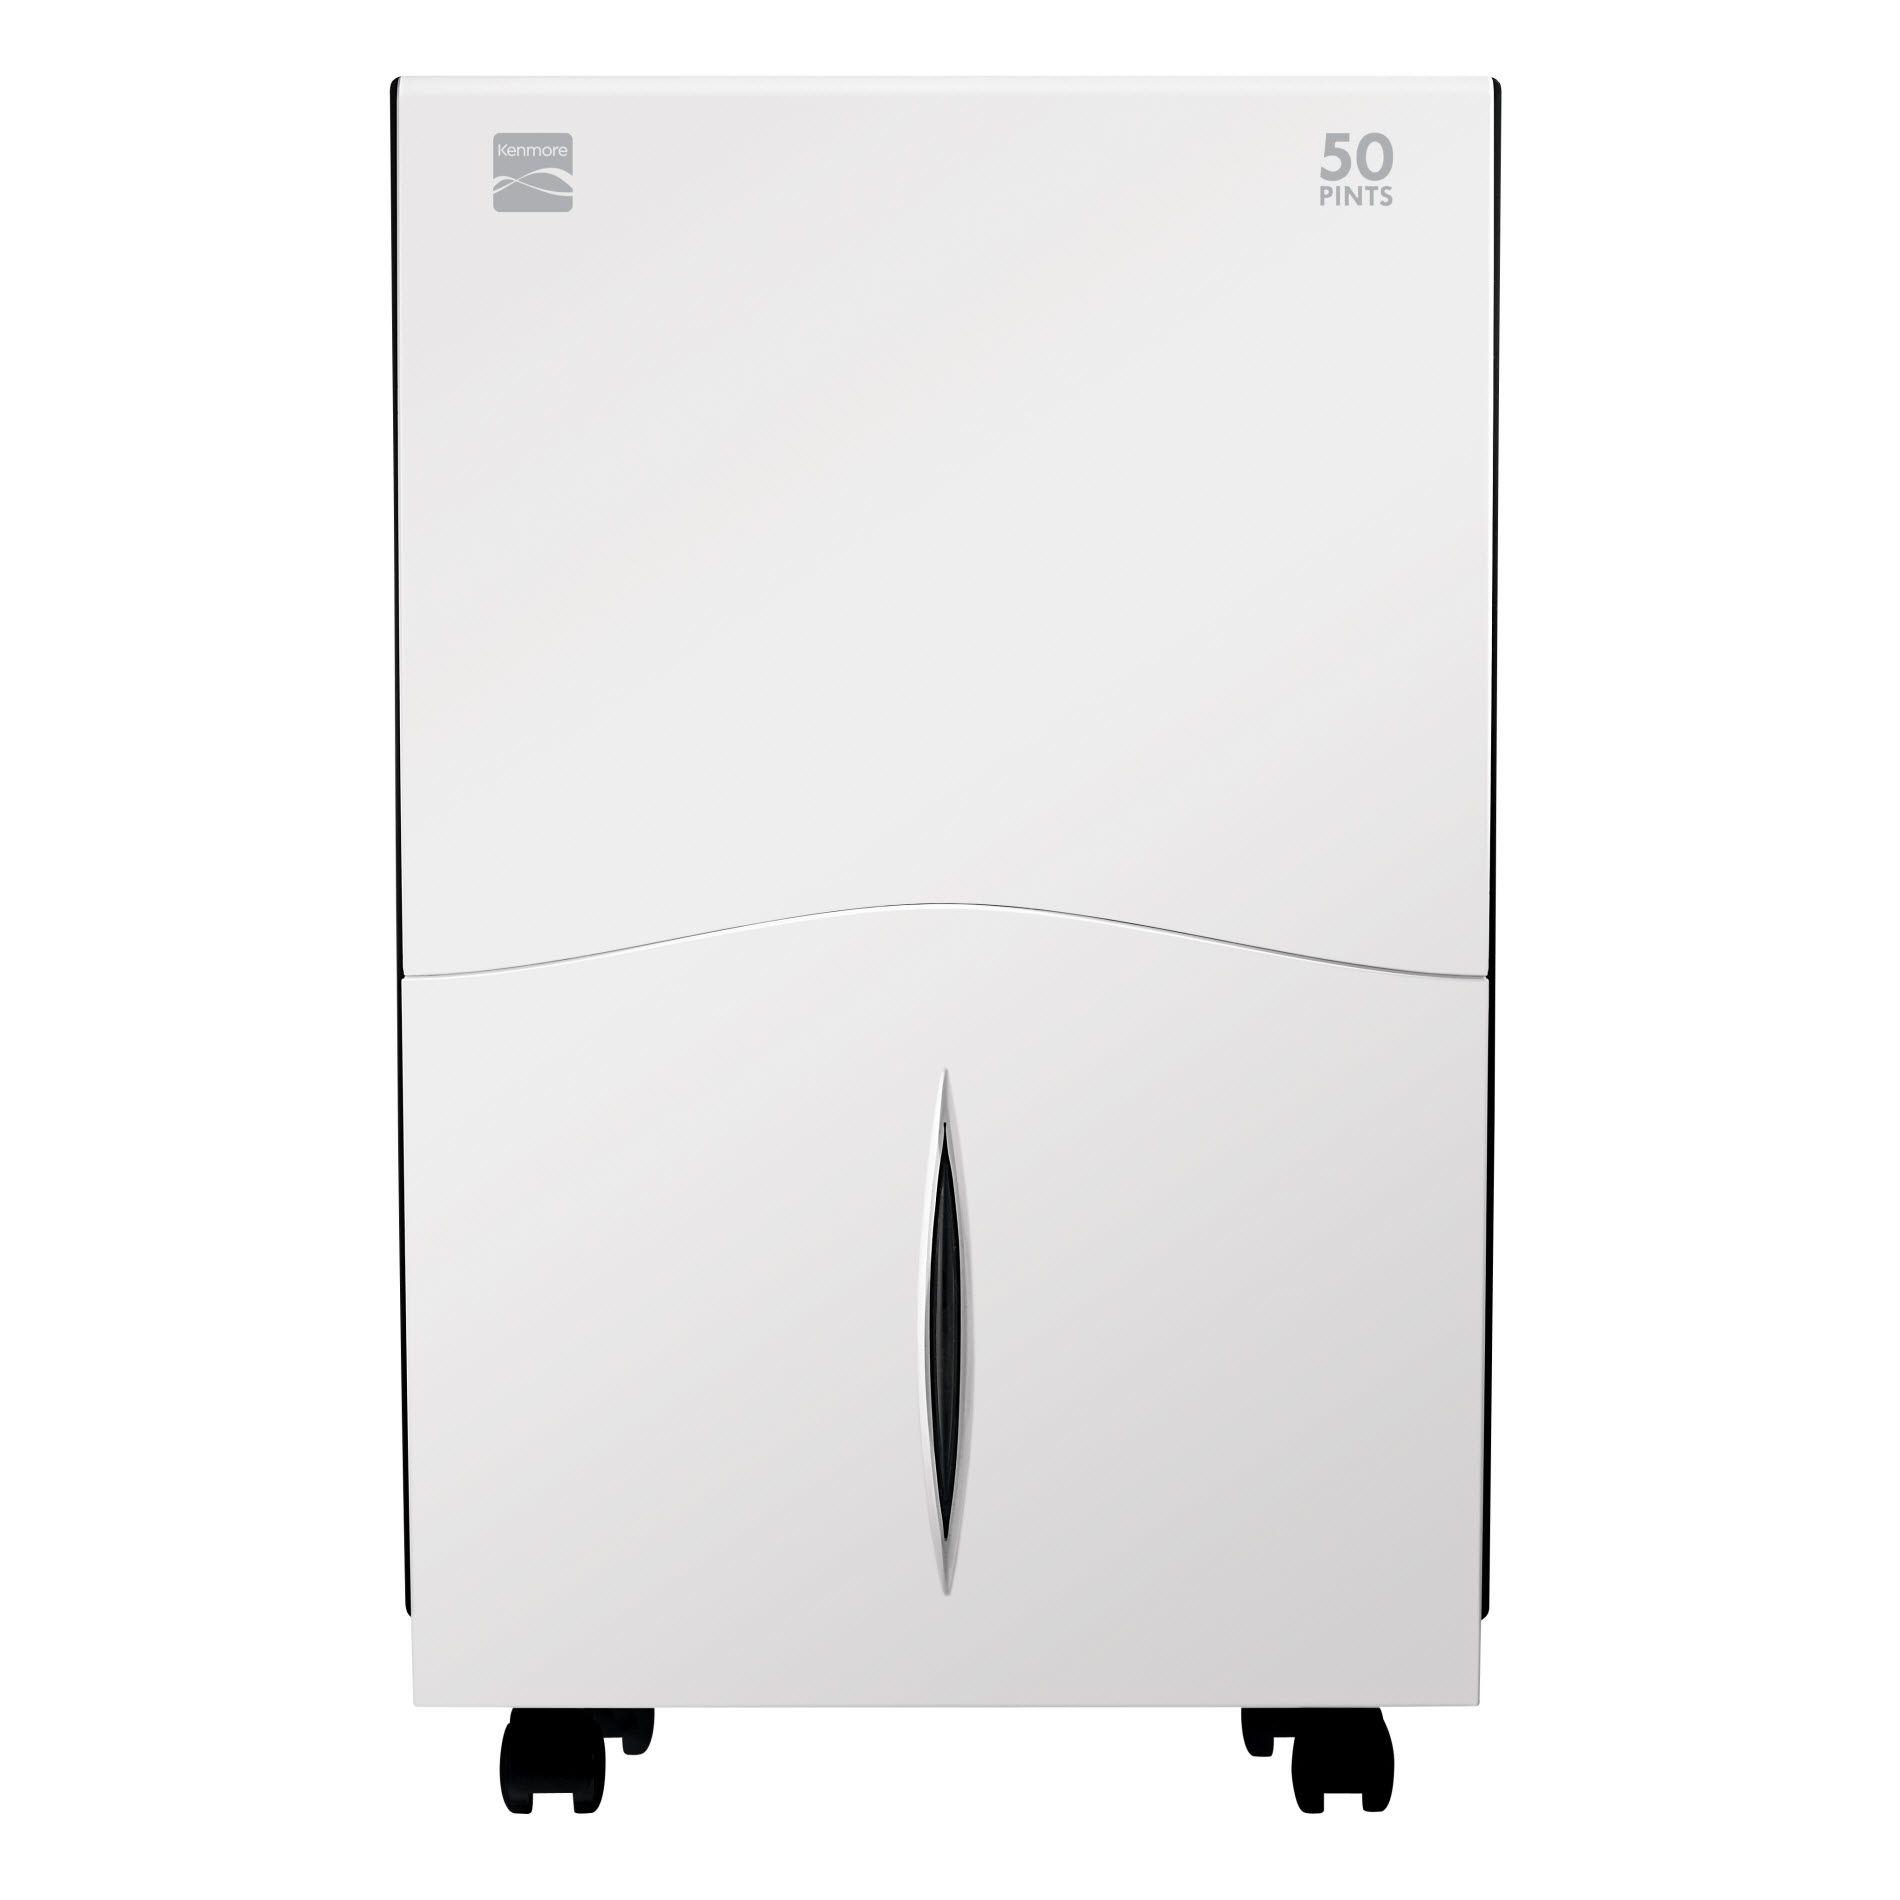 Kenmore 50-pt. Dehumidifier w/ Electronic Controls